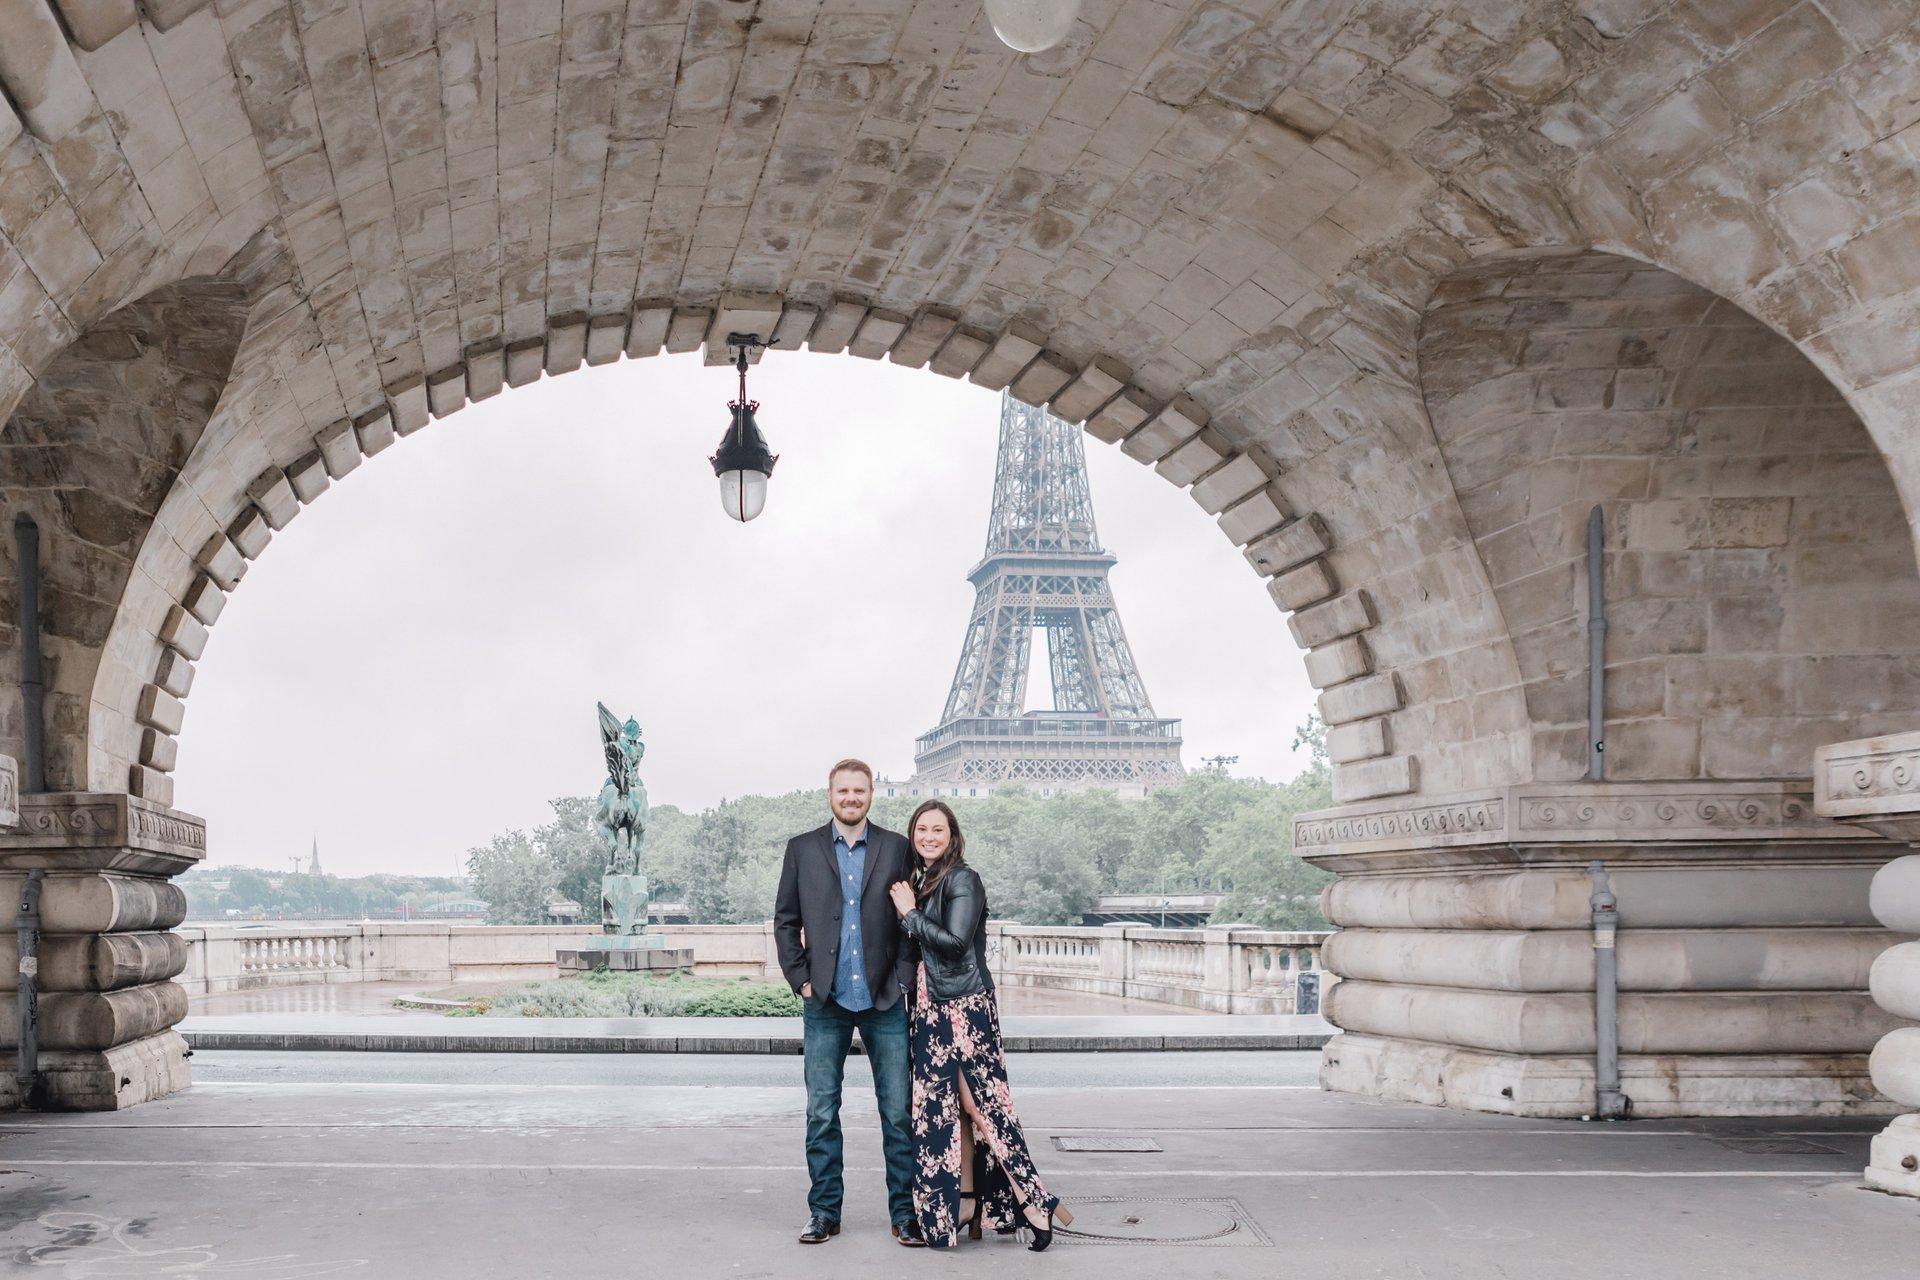 Paris-France-travel-story-Flytographer-23